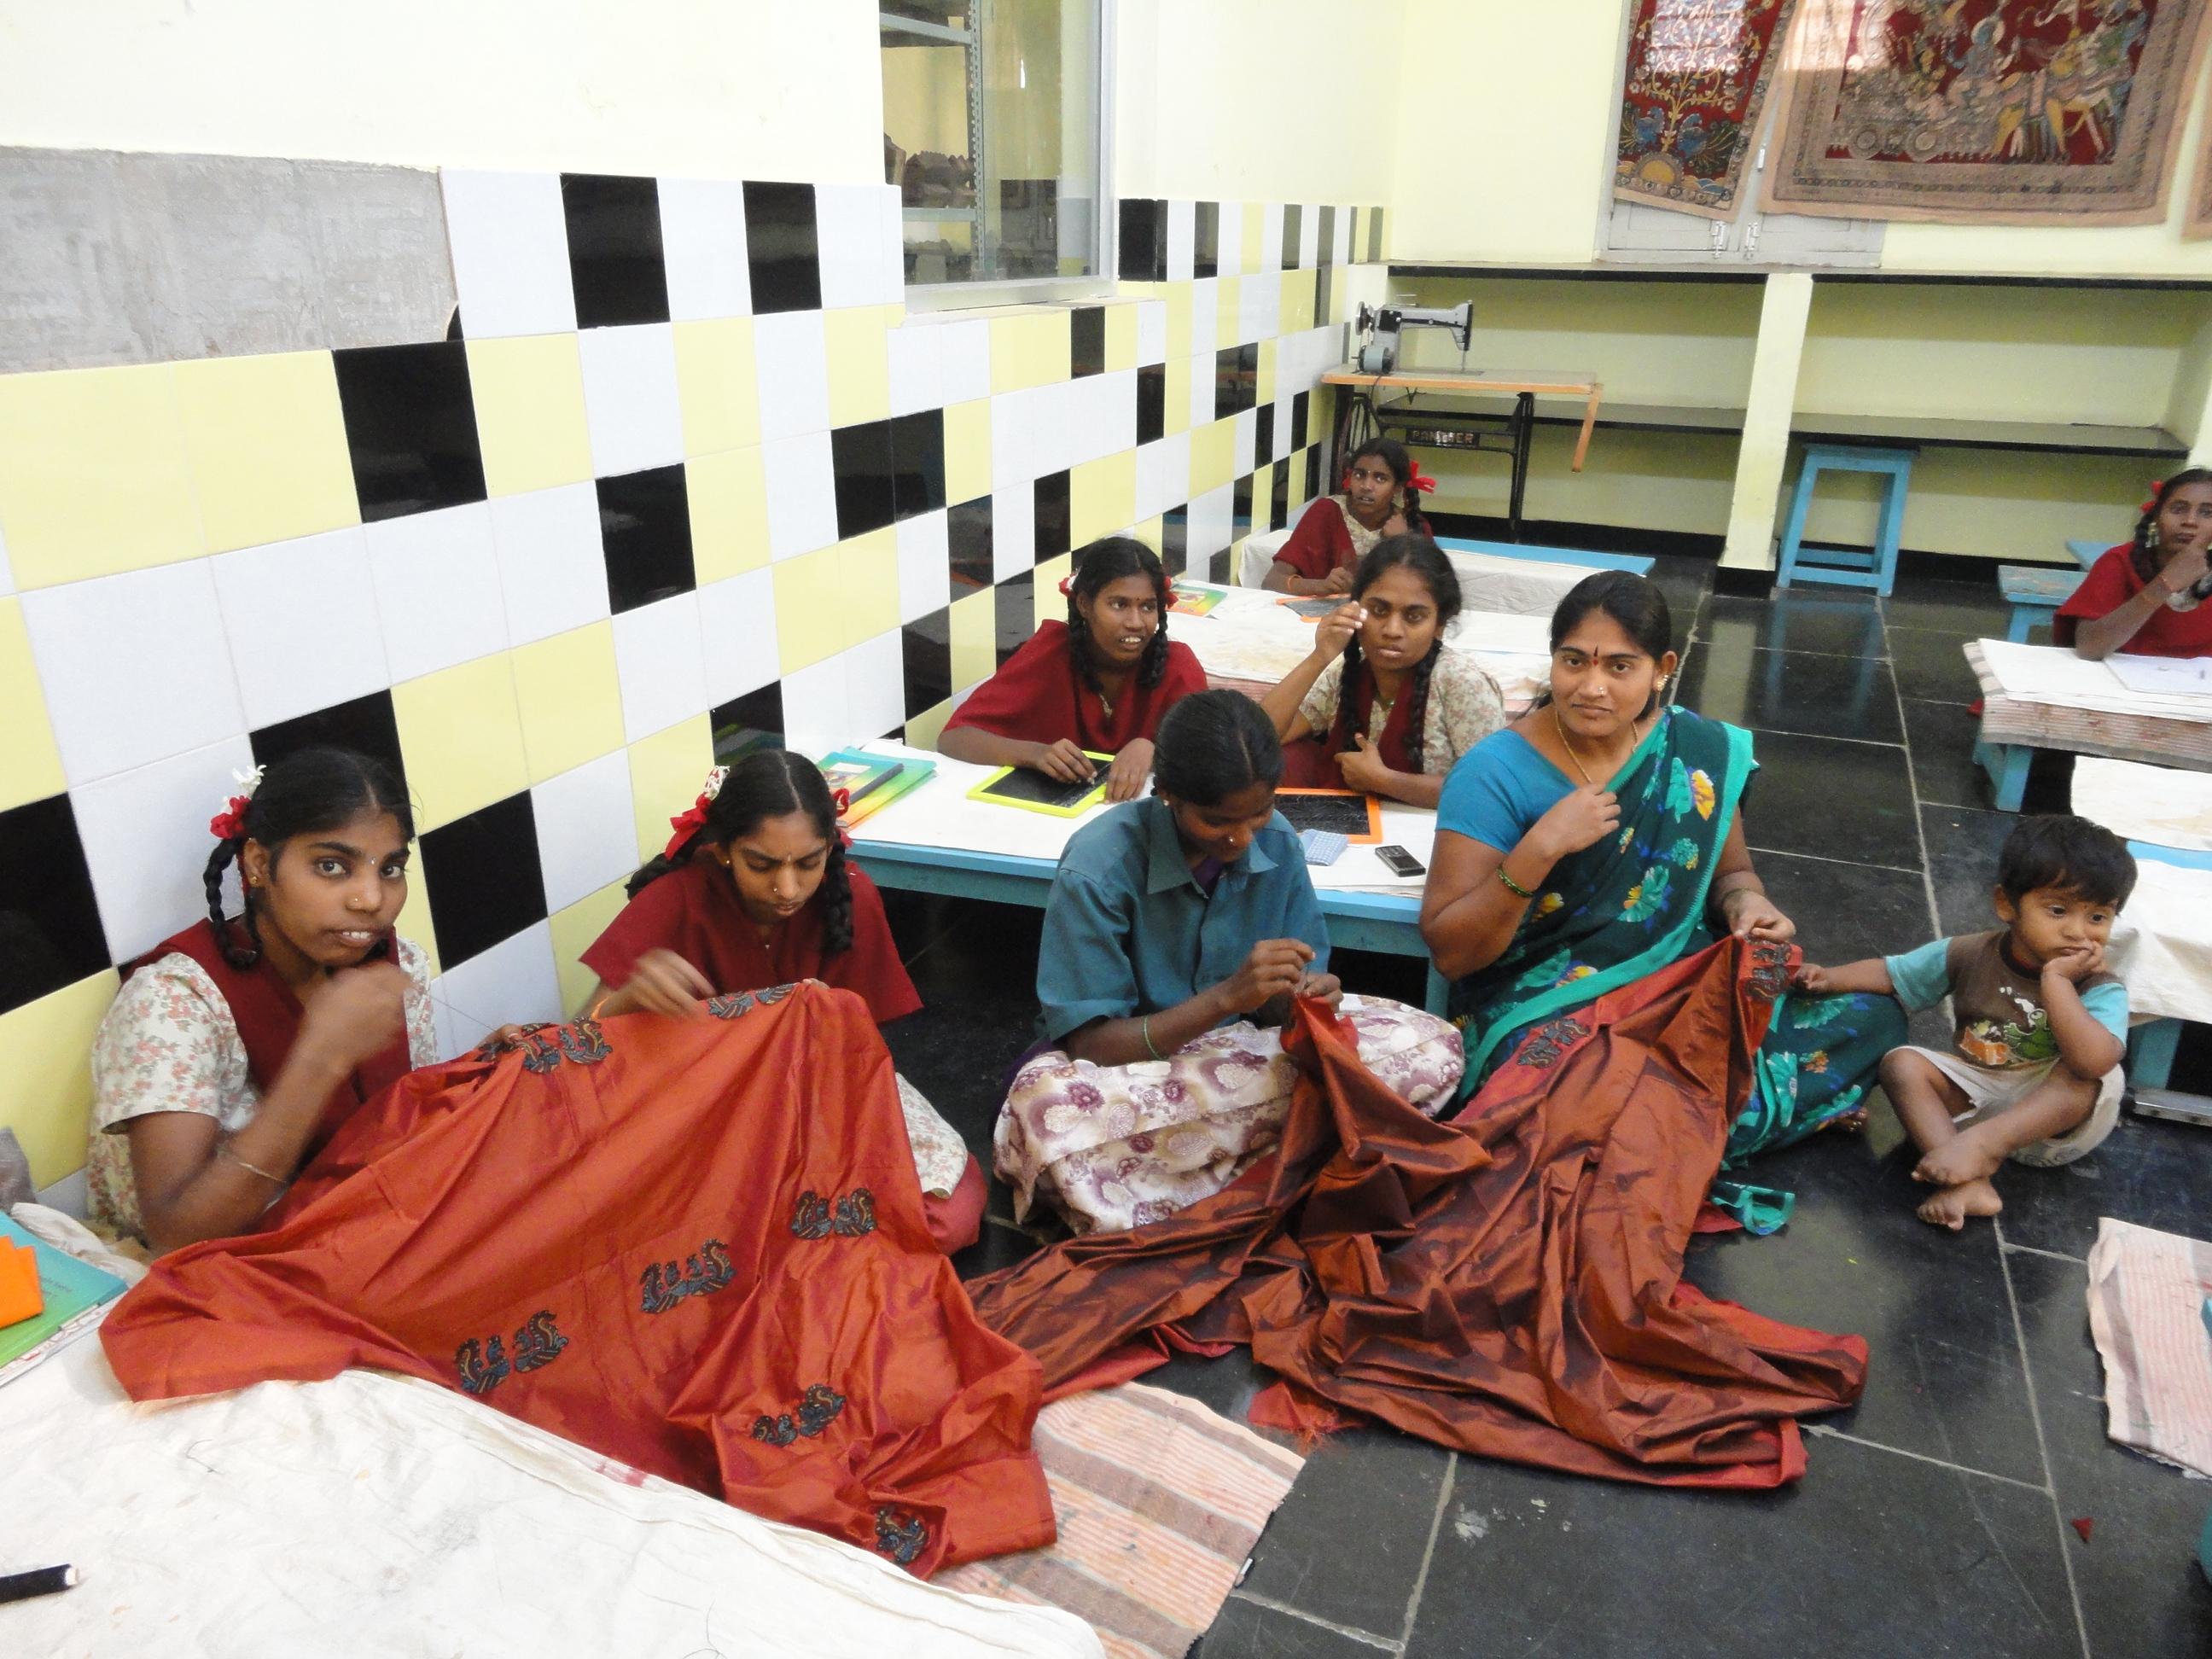 Niñas discapacitadas indias trabajando con telas. Fundación Vicente Ferrer